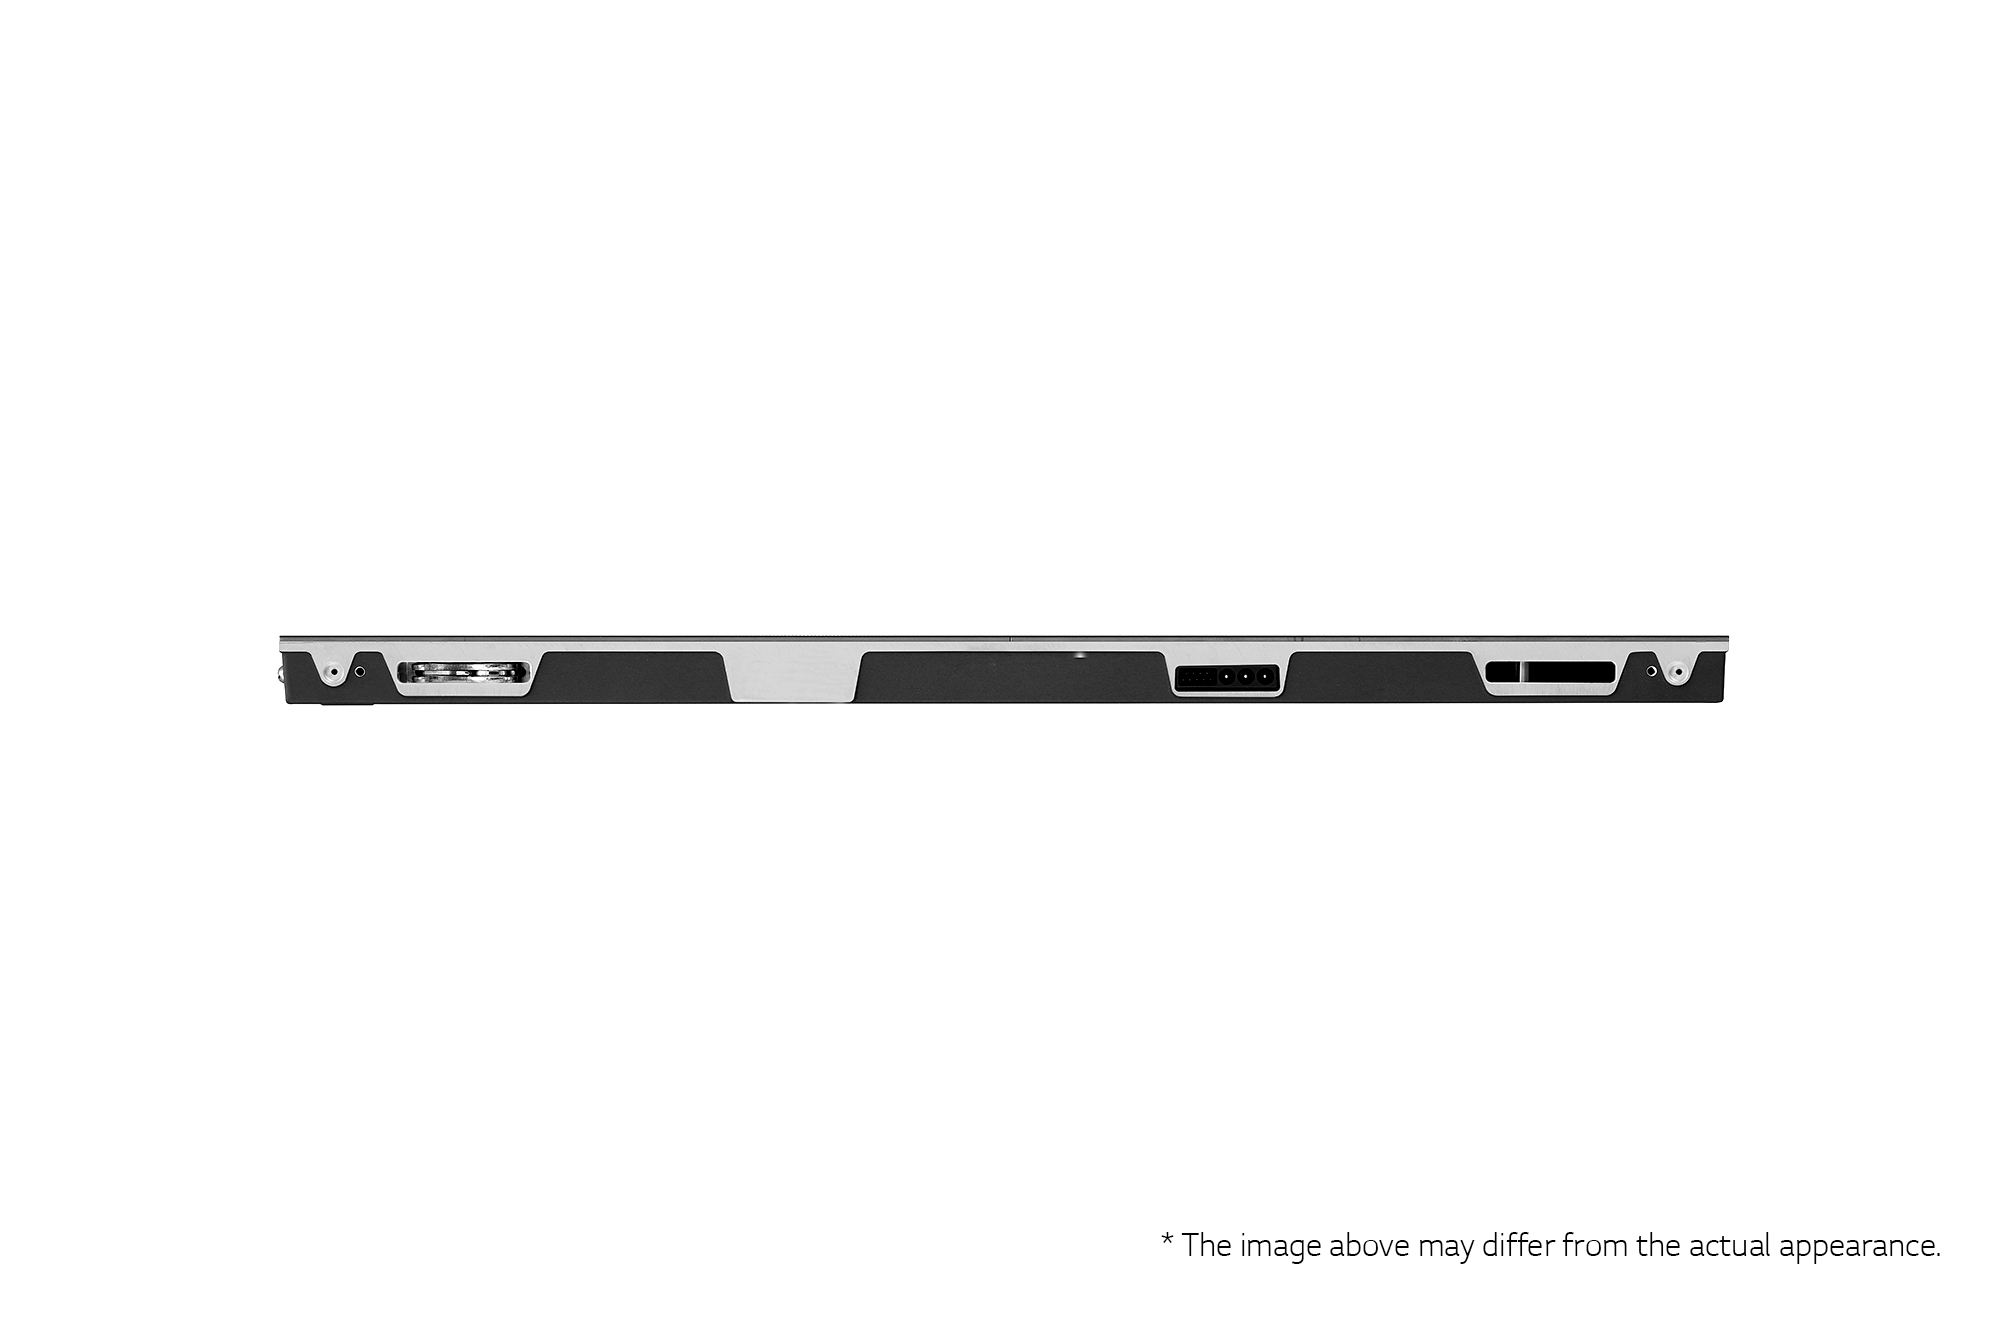 LG Ultra Slim LSCB025 9